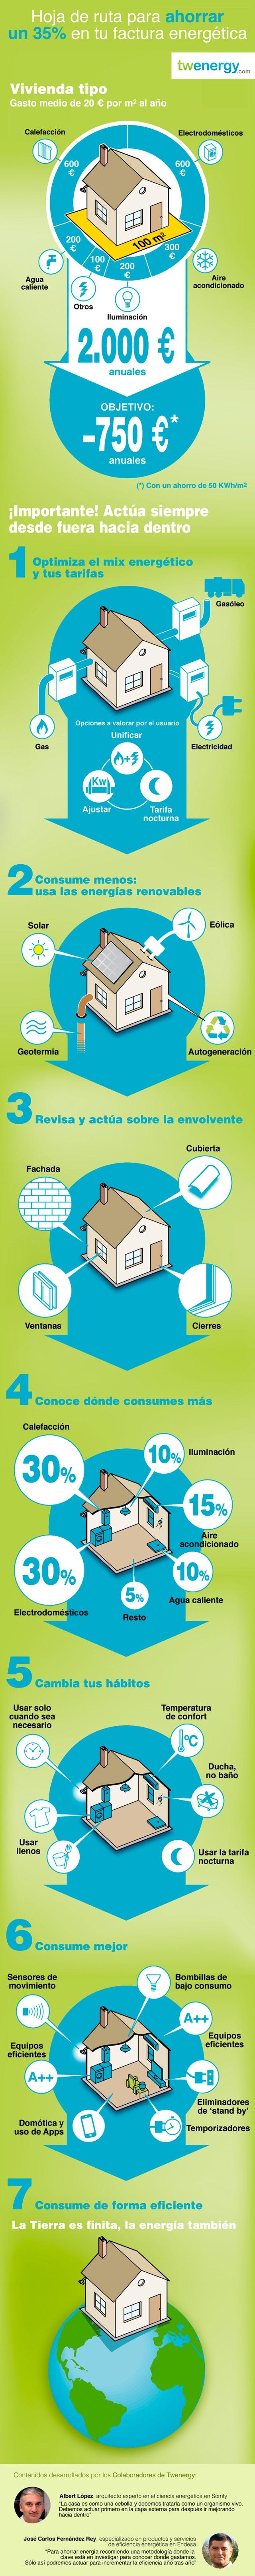 Como ahorrar hasta 750 euros en tu factura Infografía: Cómo ahorrar hasta 750 euros al año en tu factura energética